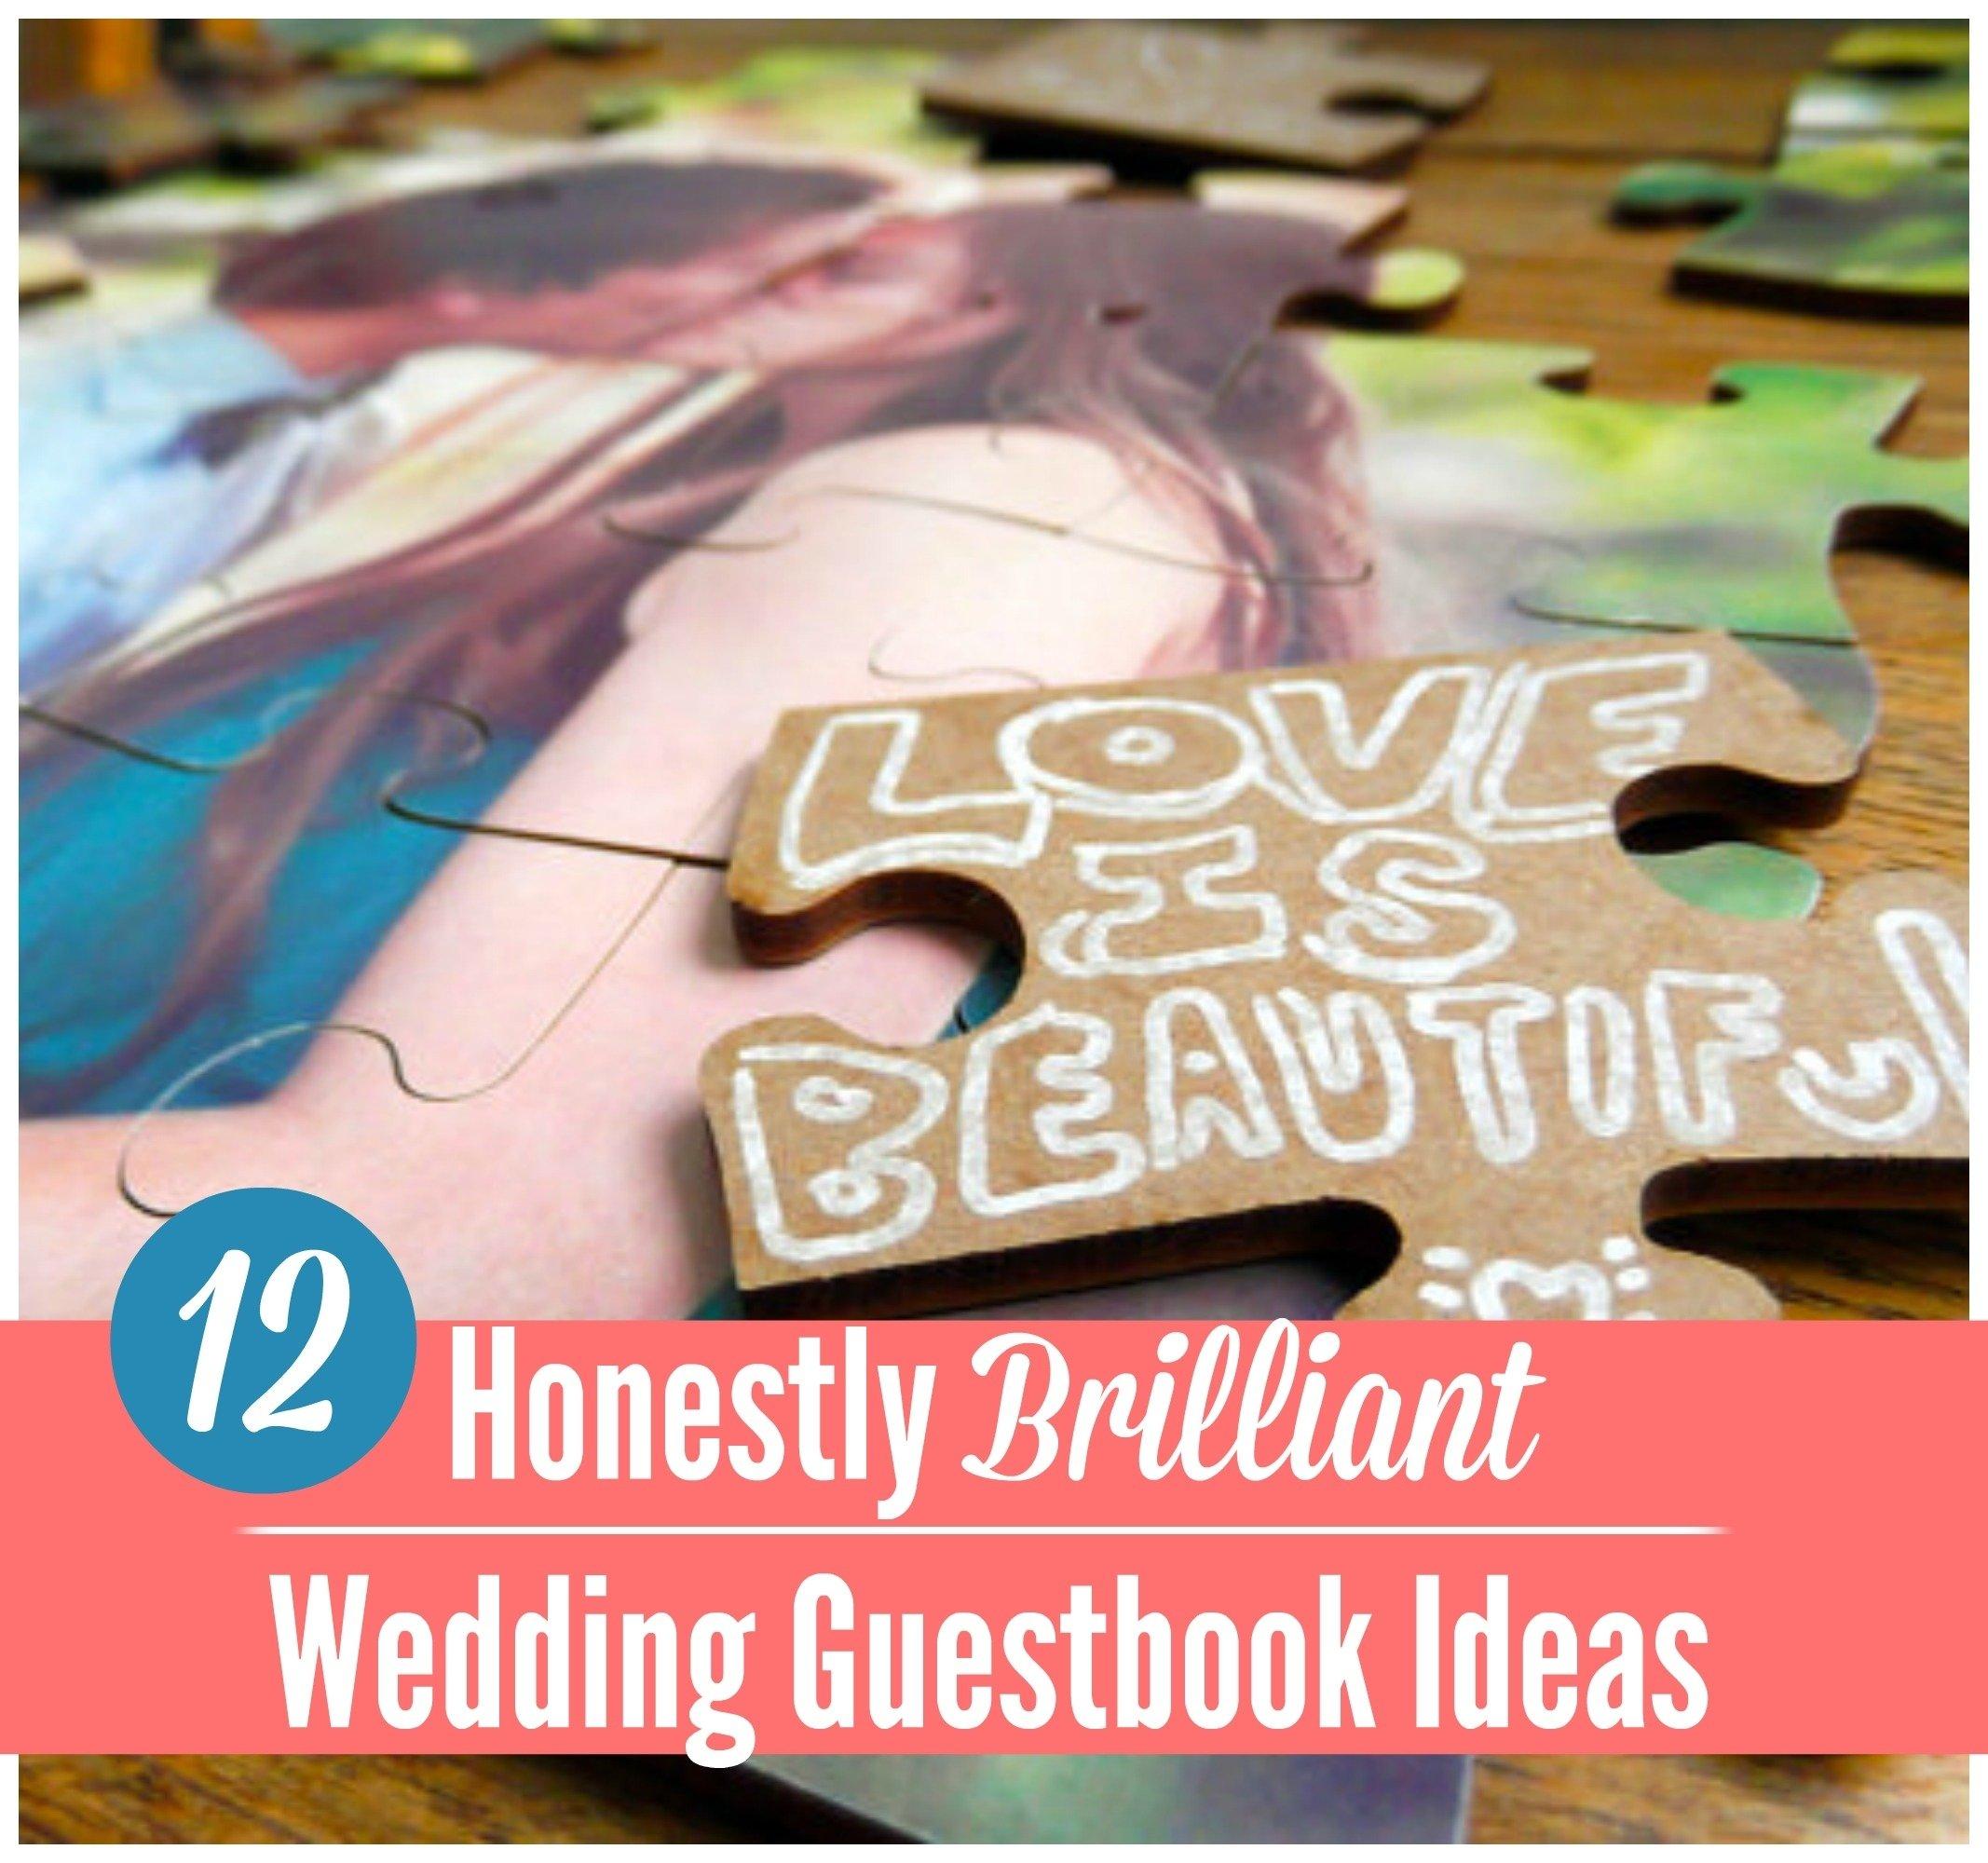 10 Attractive Unique Wedding Guest Book Ideas 15 insanely unique wedding guest book ideas craft paper scissors 2020